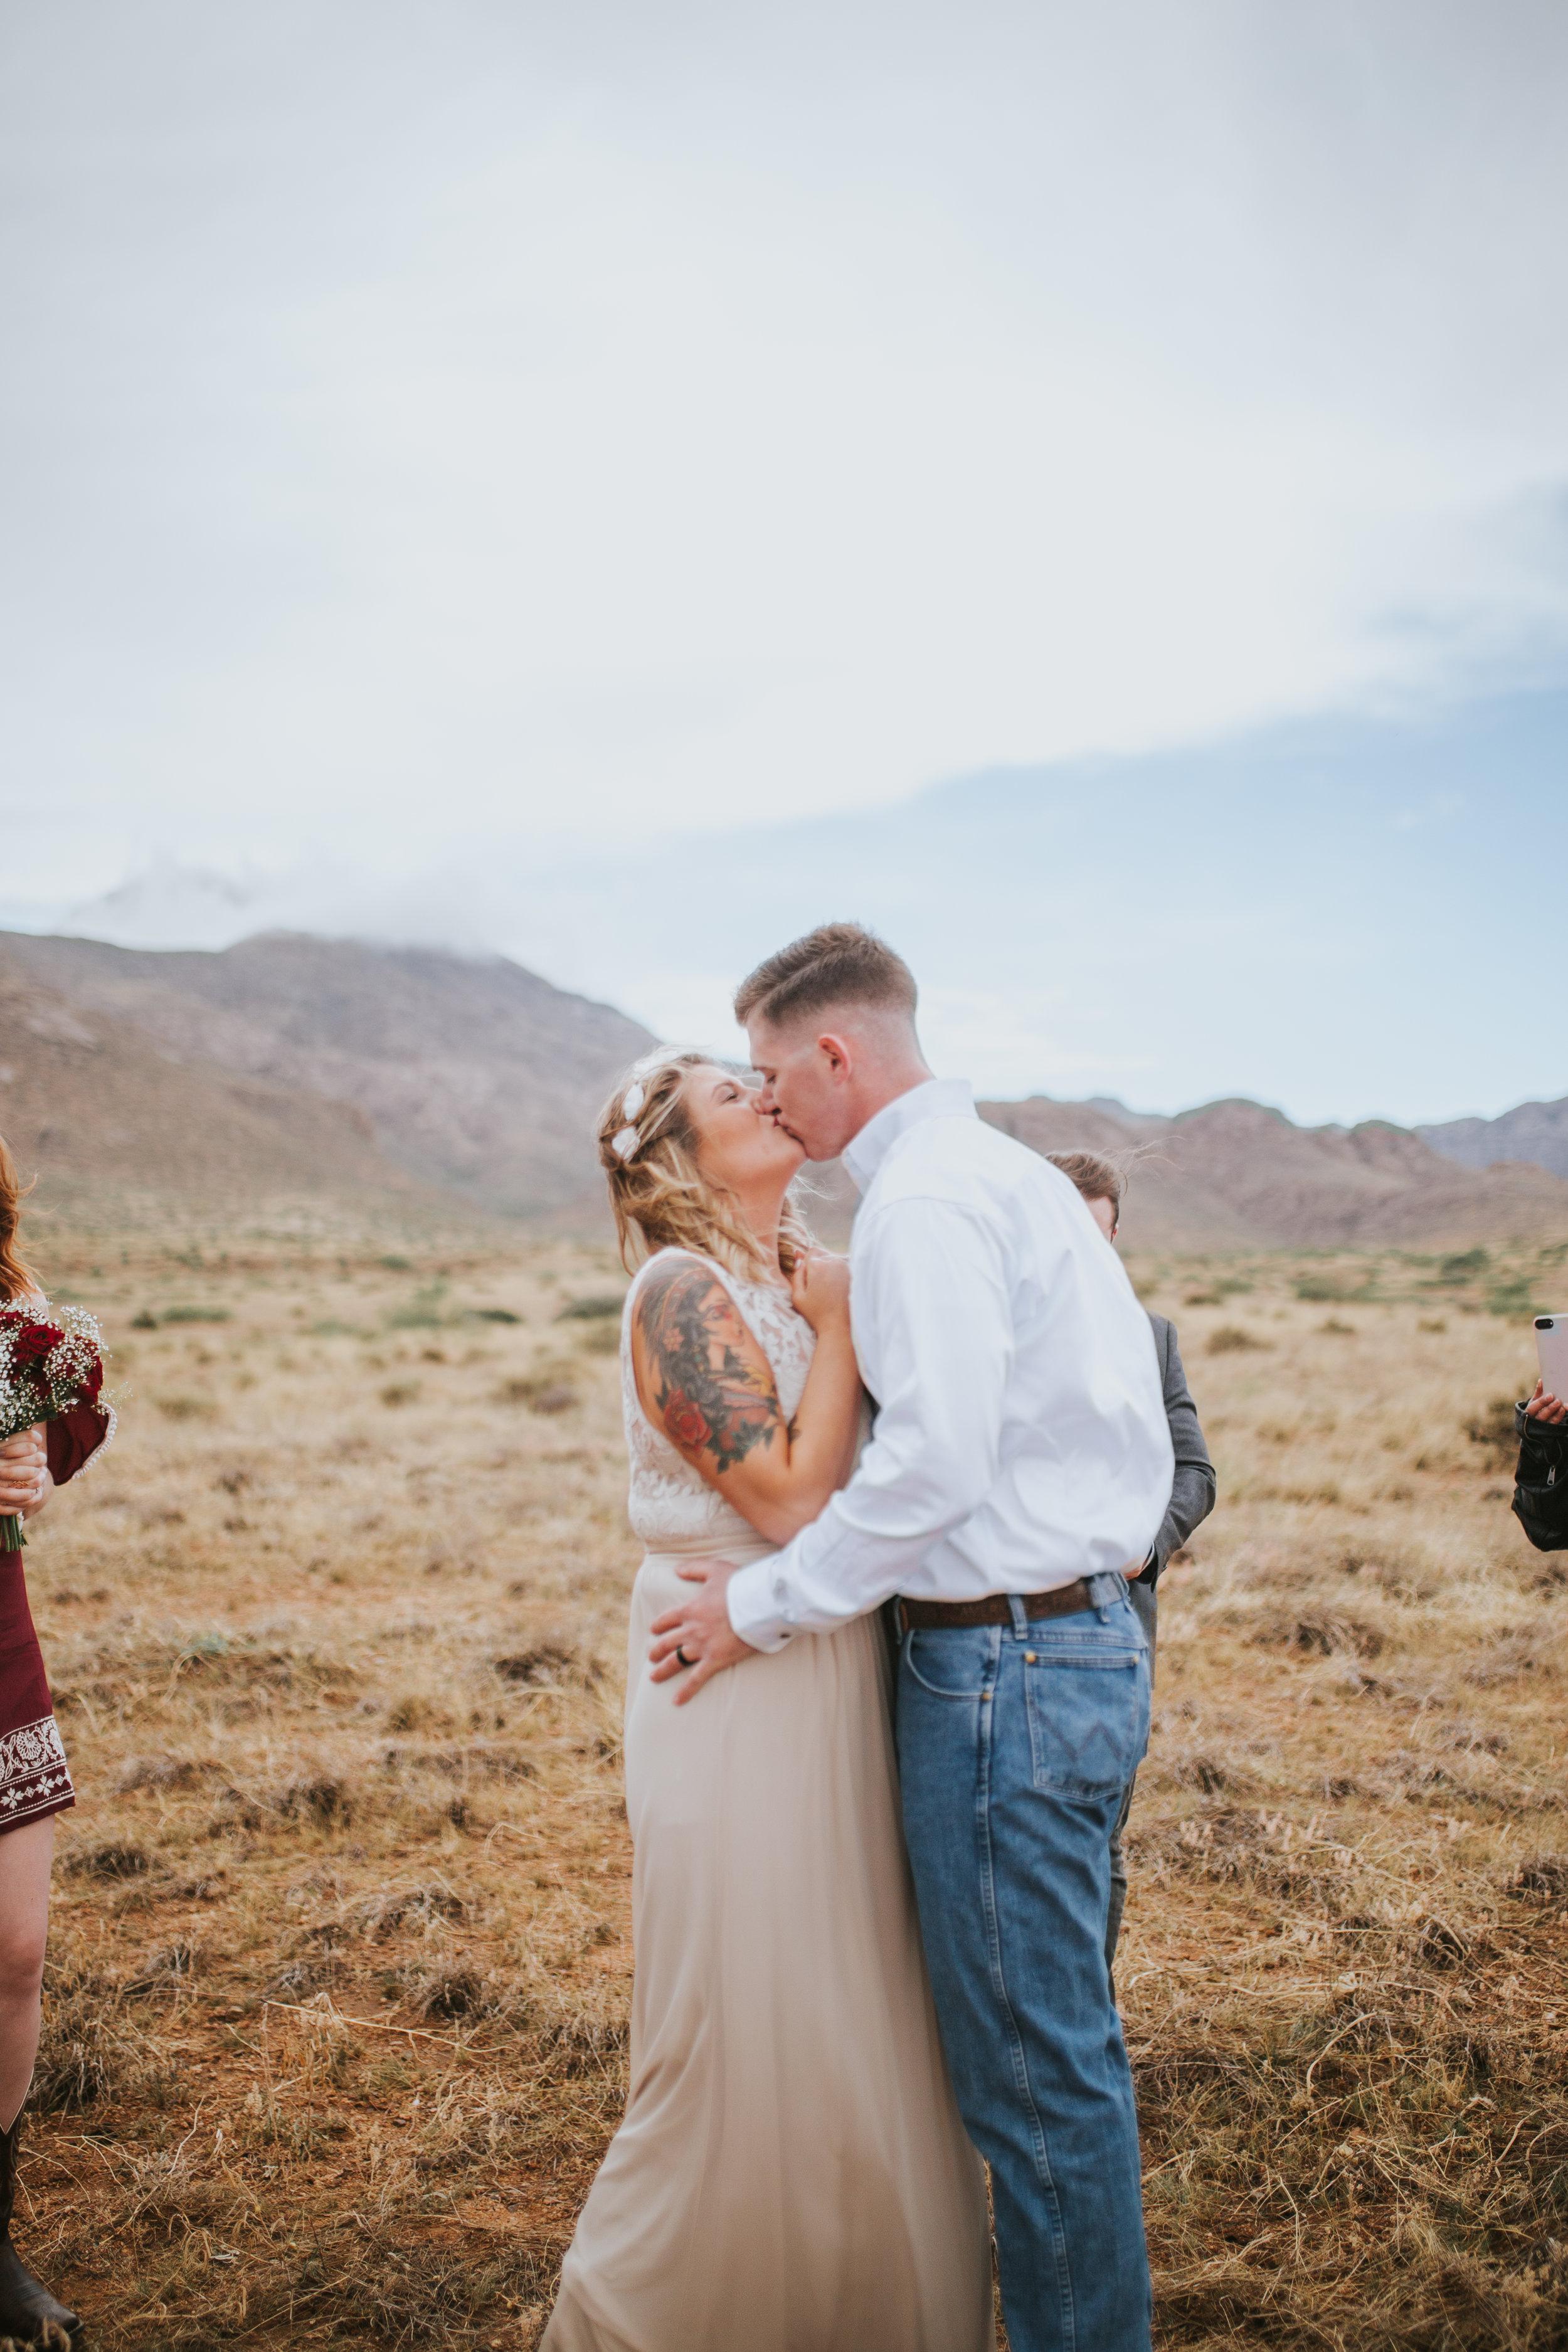 el-paso-texas-wedding-photographer-23